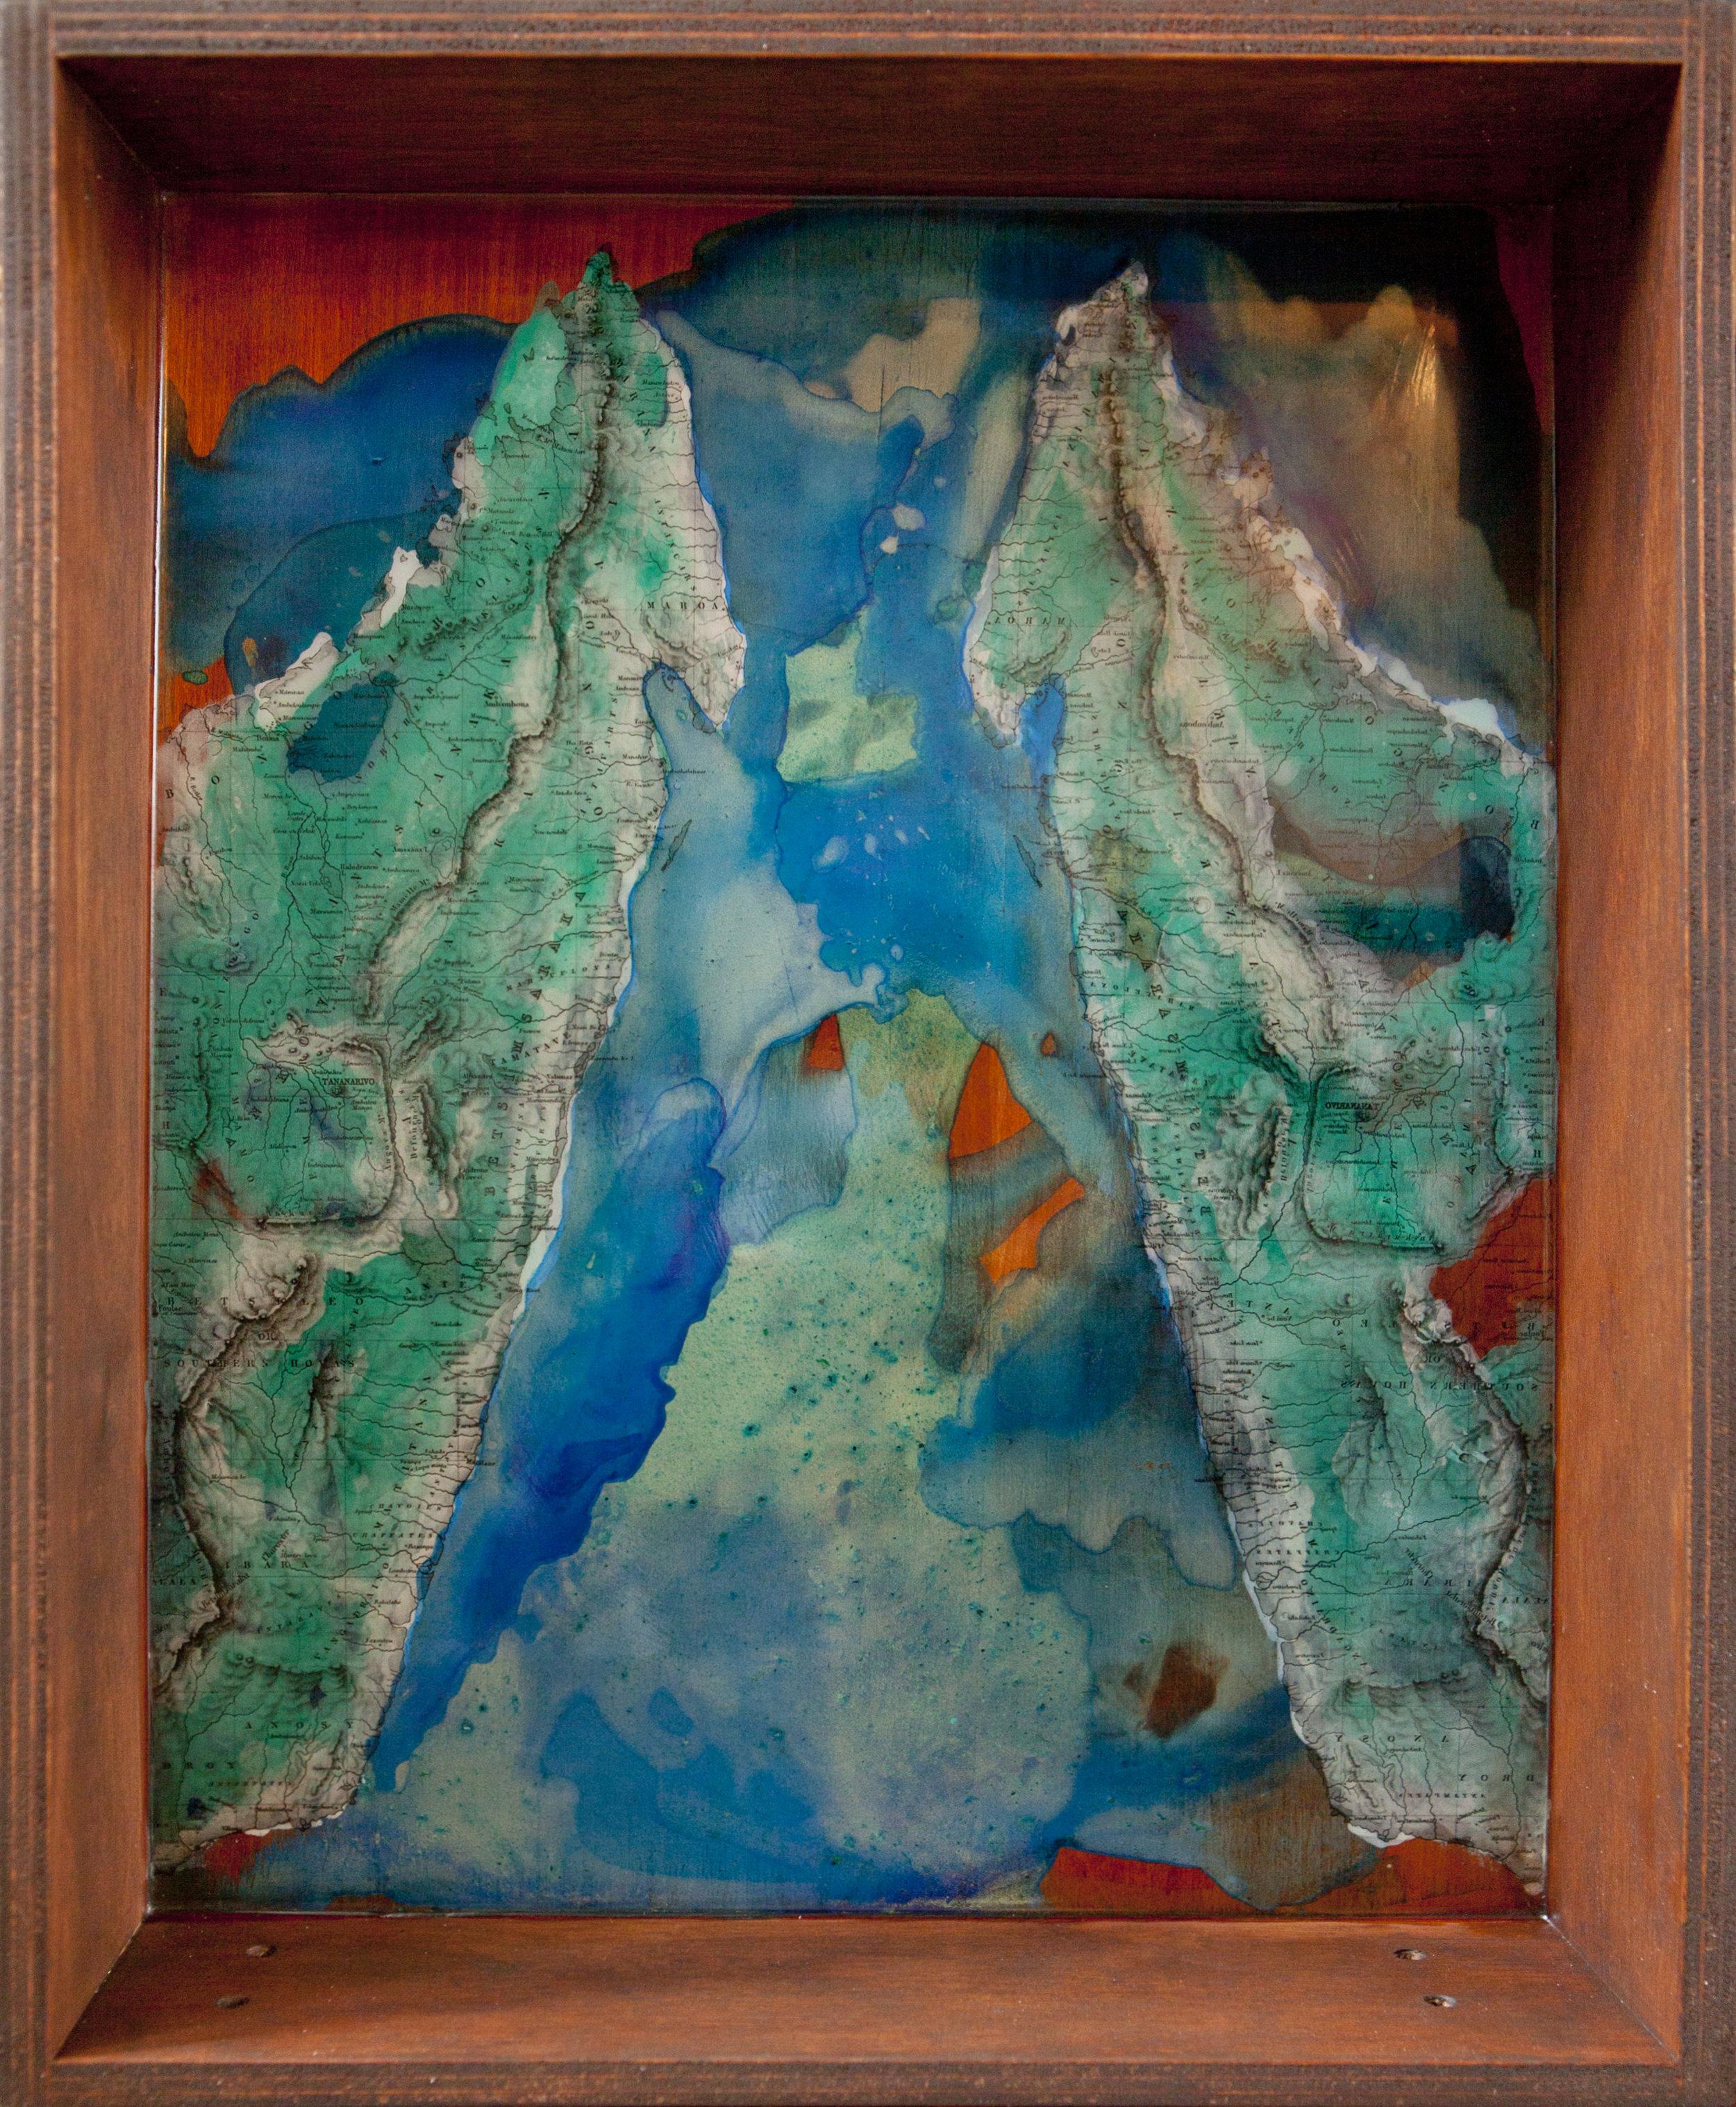 Shiraz Bayjoo    Le grand L'Ile    Acrylic, resin, reclaimed furniture  45 x 36 x 10 cm  2012